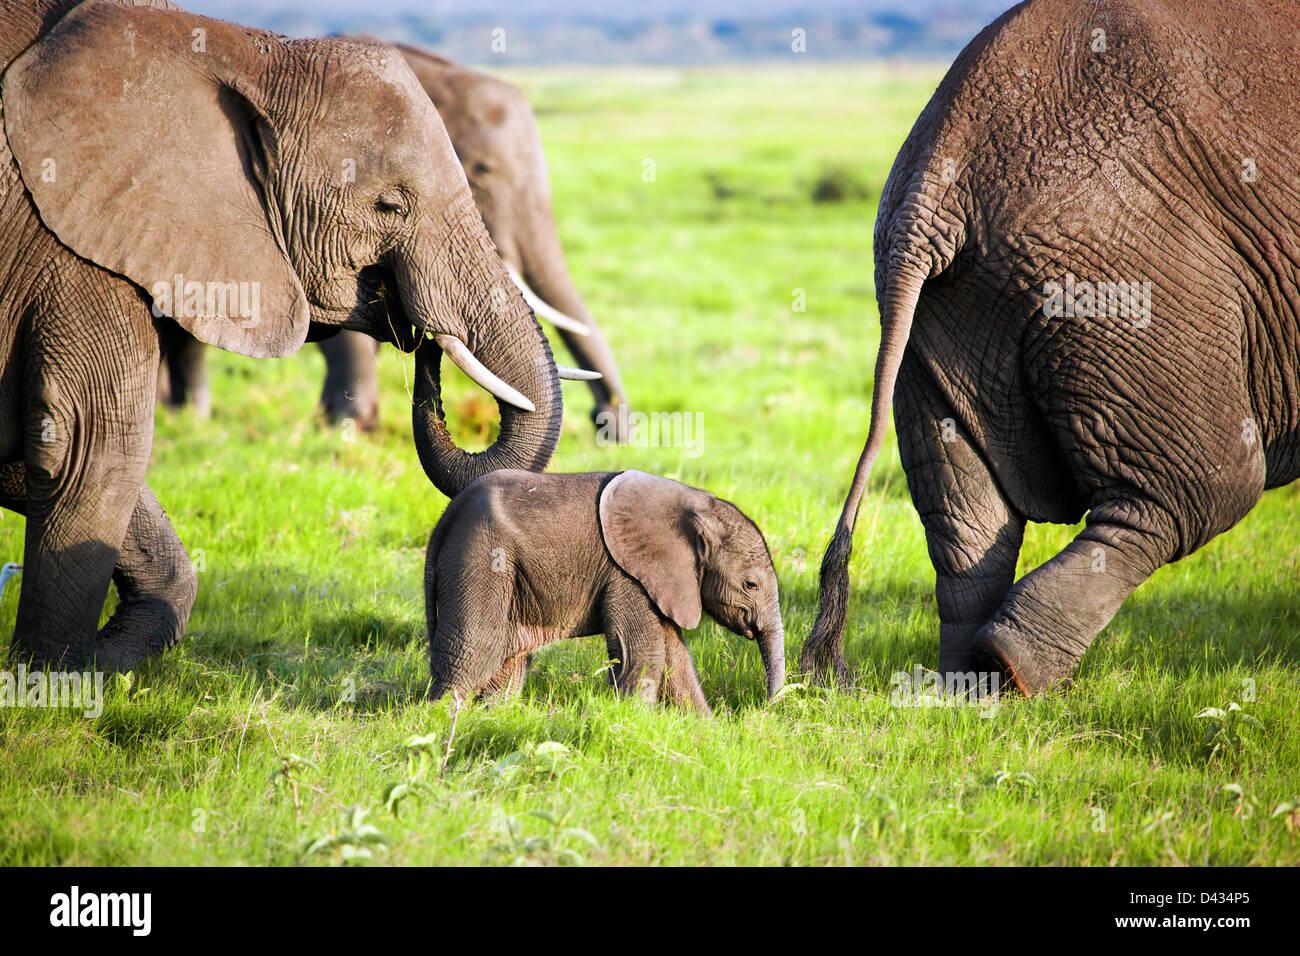 Baby Elephant e famiglia sulla savana africana in Amboseli National Park, Kenya, Africa Immagini Stock